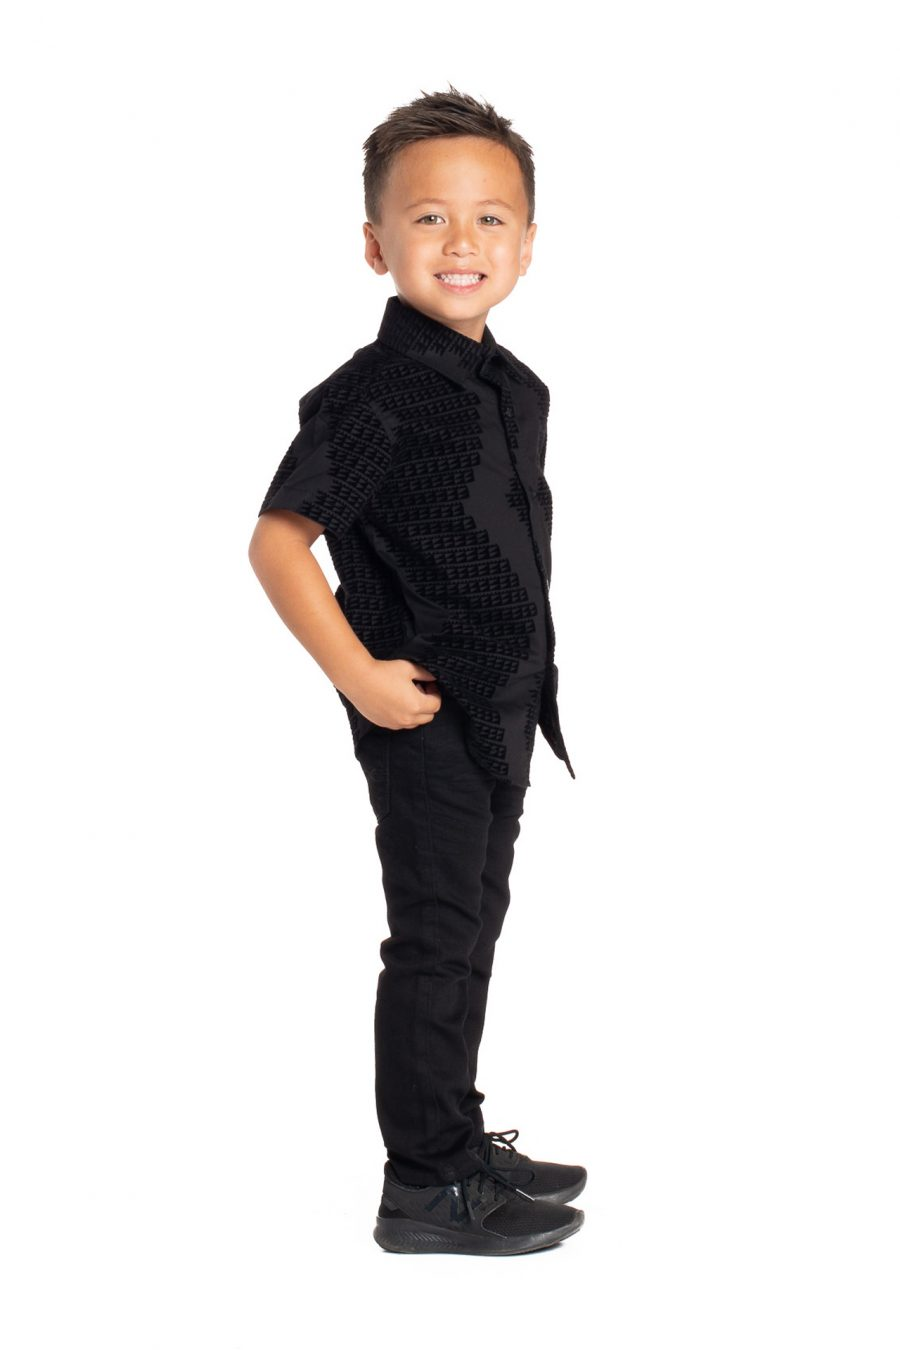 Boy wearing Keiki Aloha Short Sleeve in Black Niho Mano - Side View